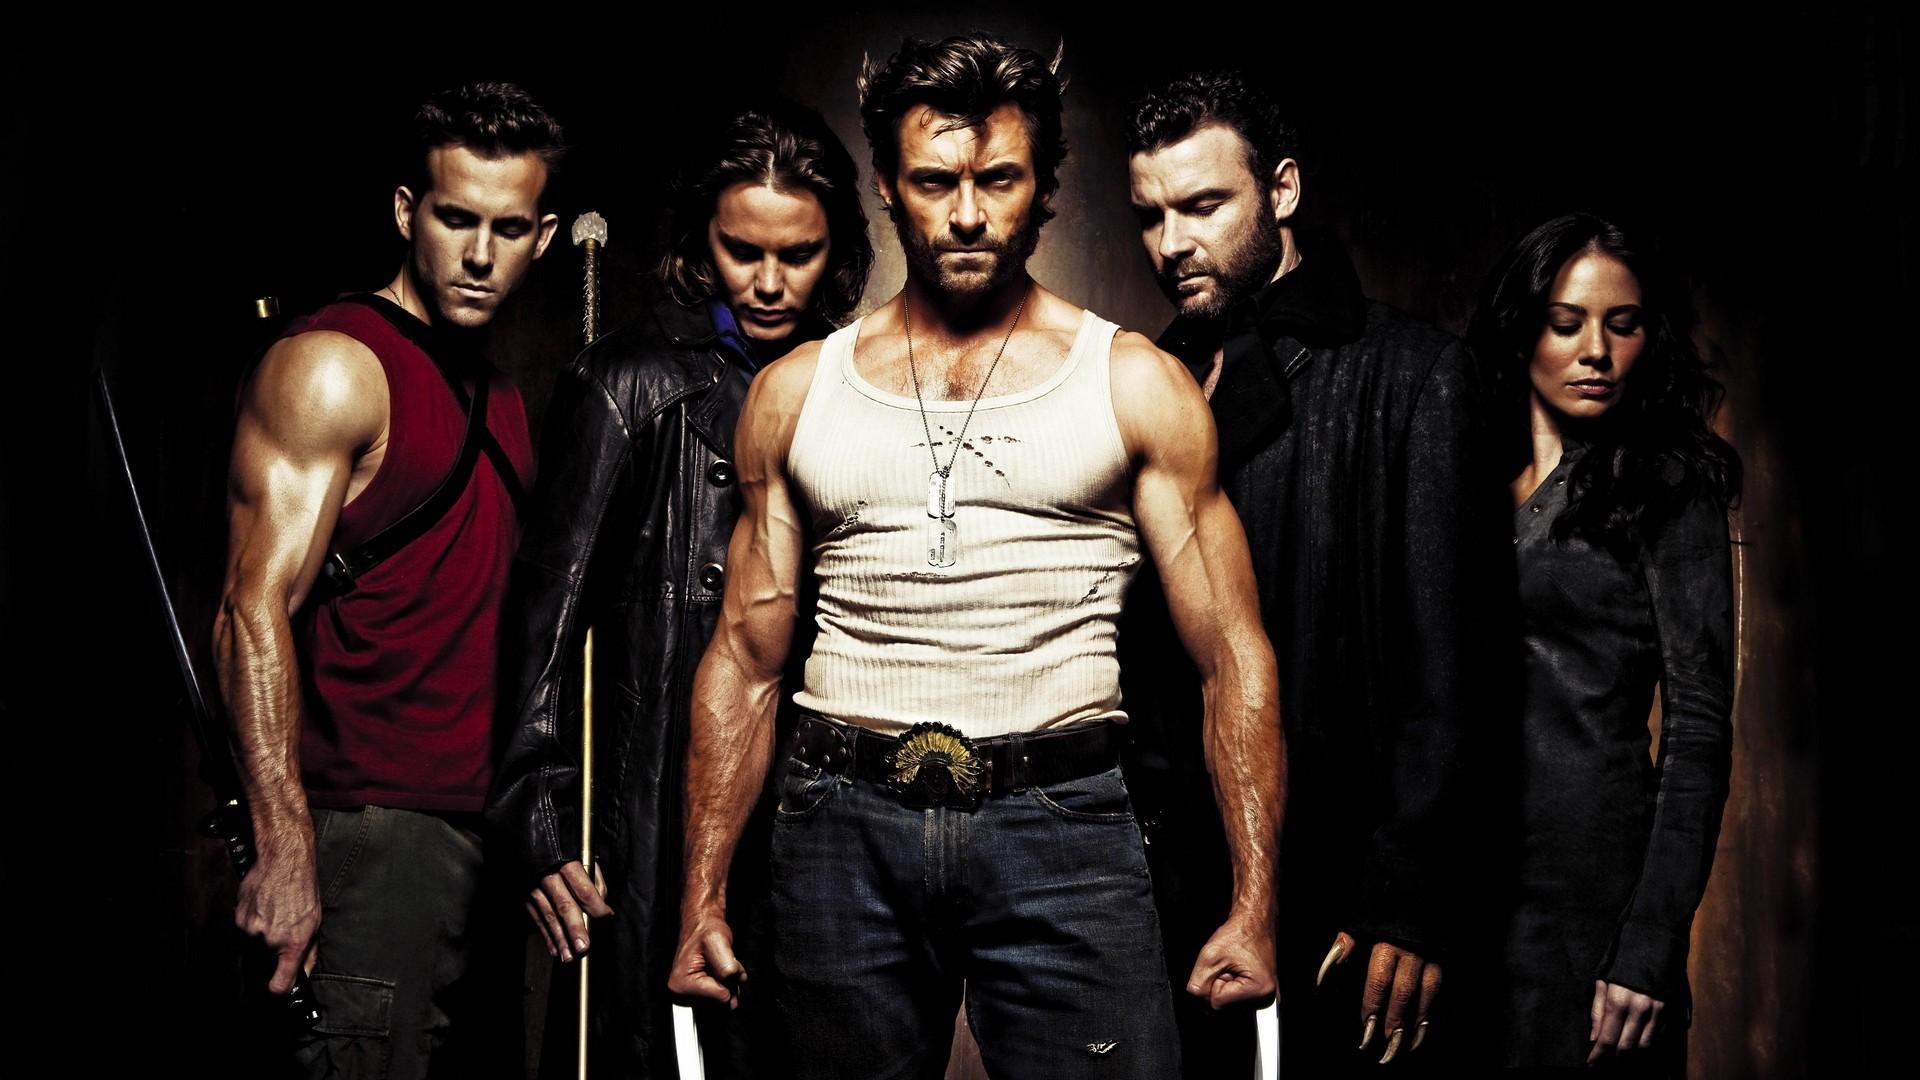 General 1920x1080 movies X-Men Origins: Wolverine Wolverine Gambit Wade Wilson Deadpool Hugh Jackman Ryan Reynolds